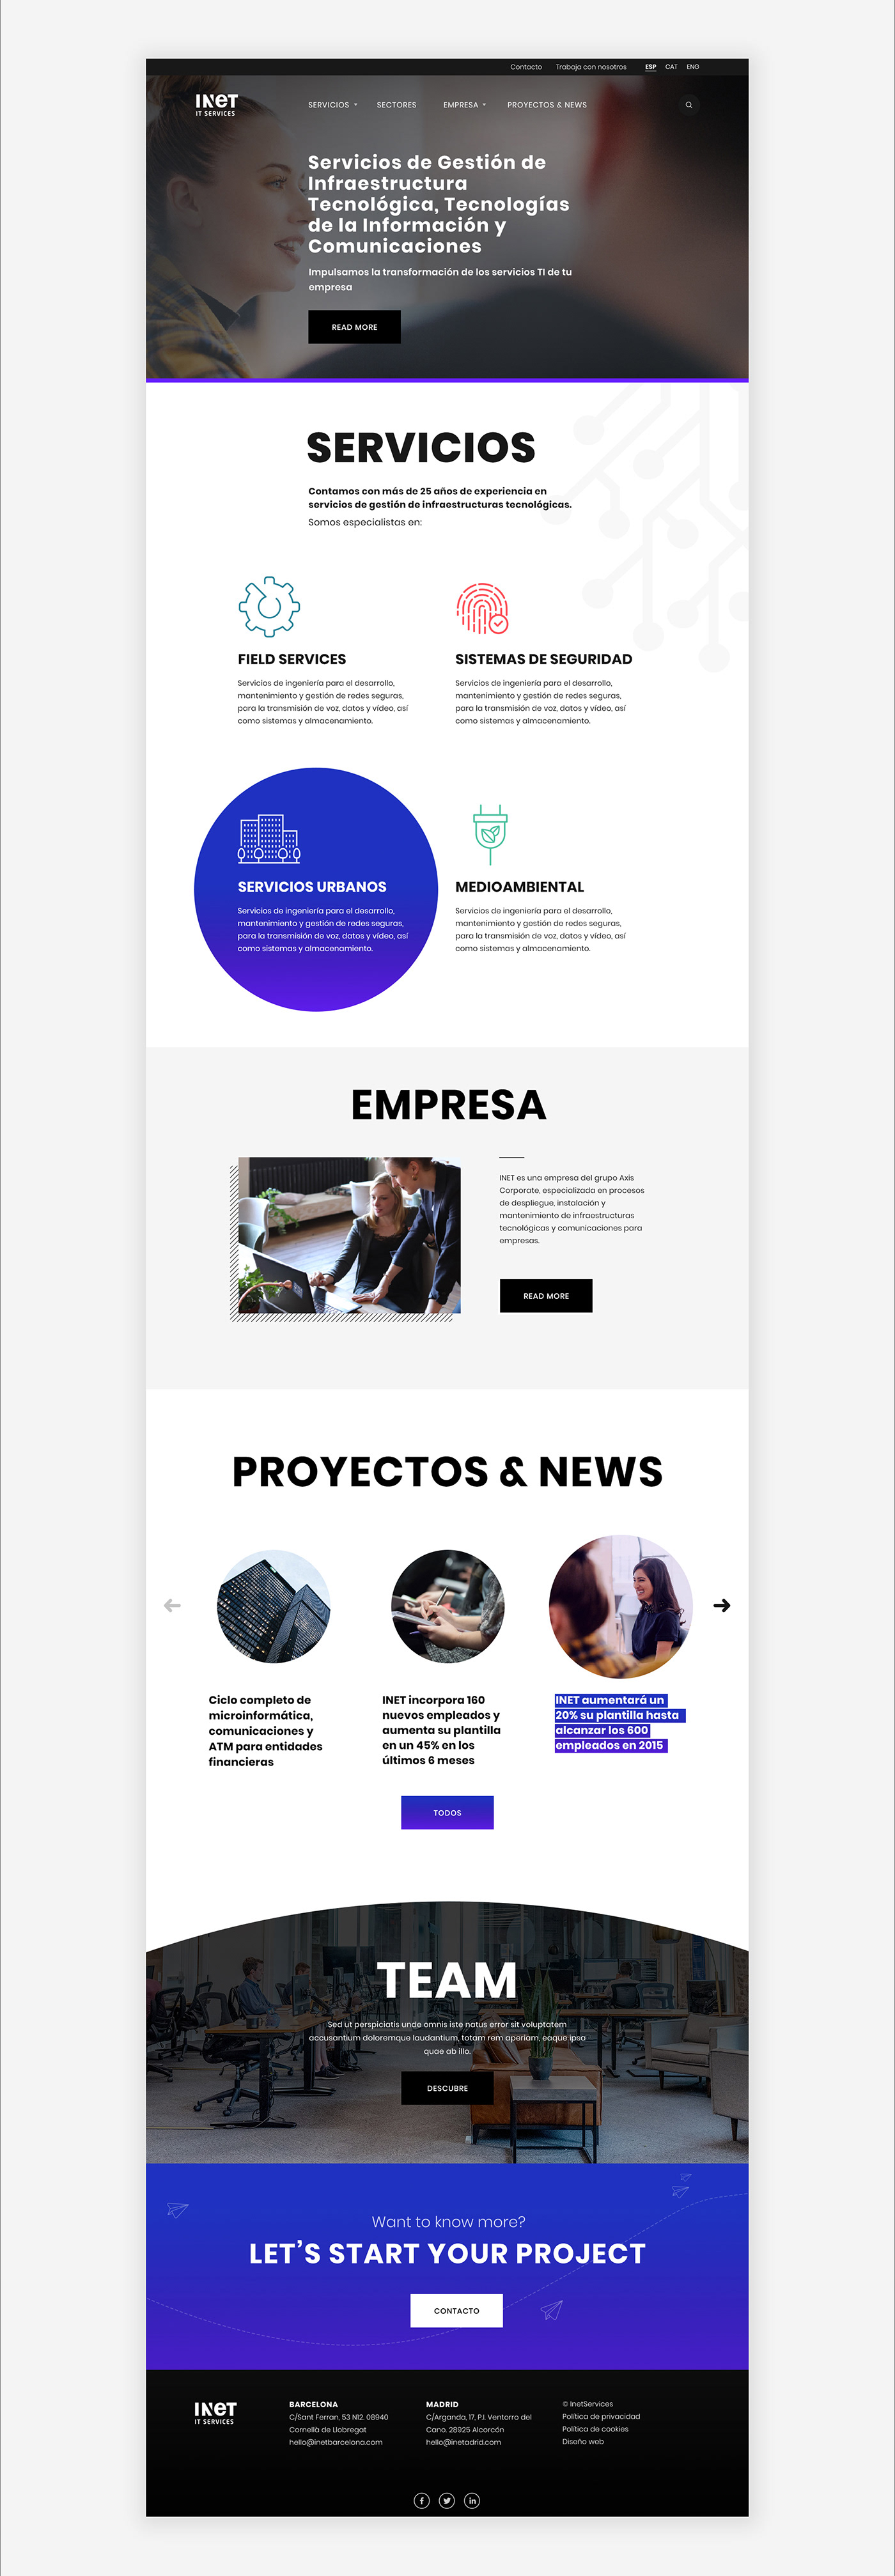 corporate digital art direction digital design services ui design visual design Web Design